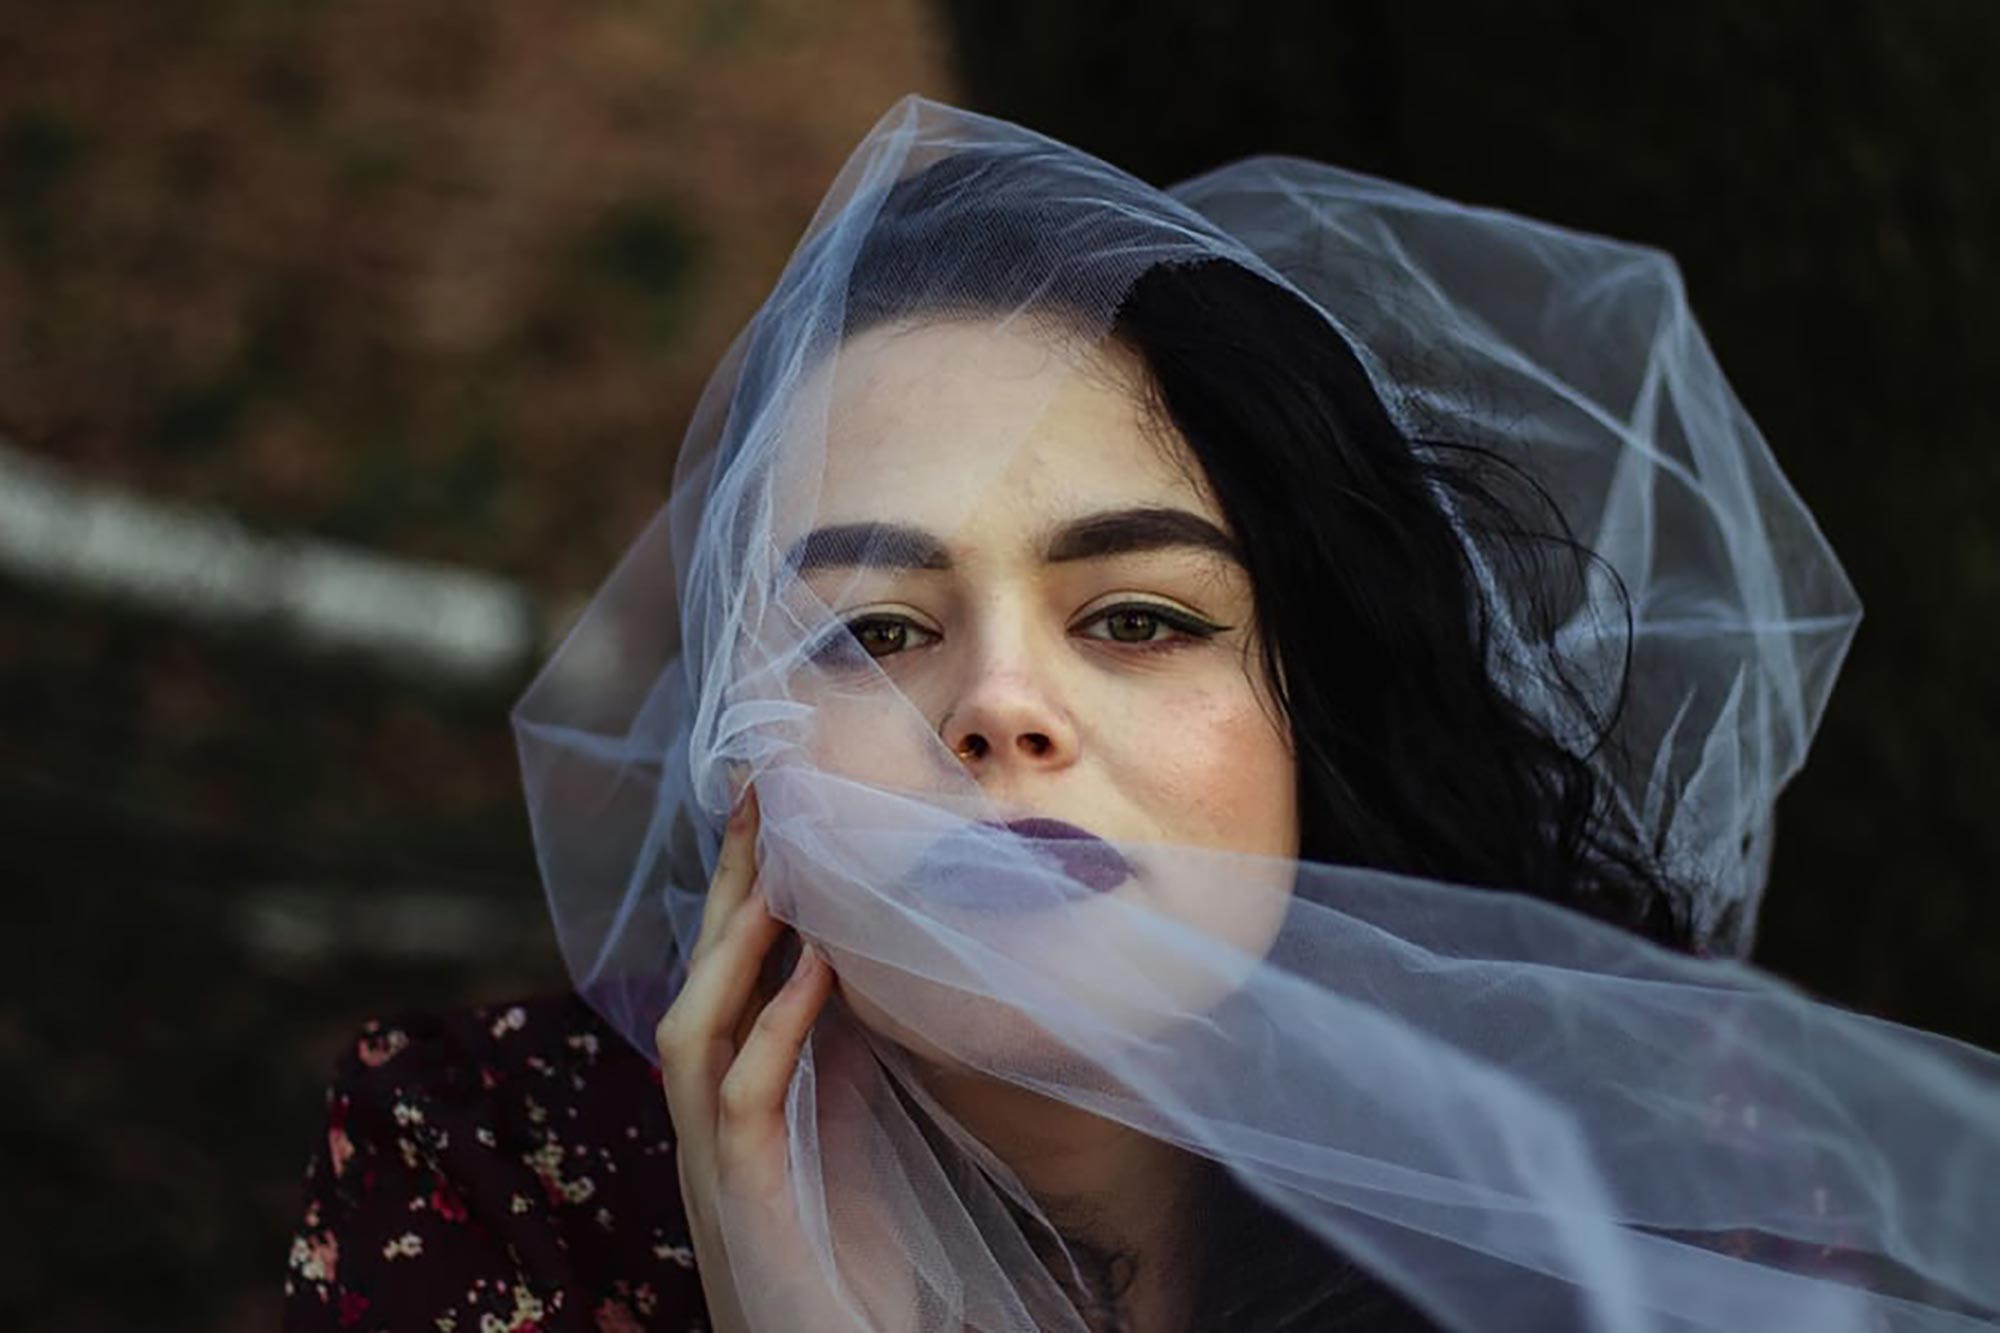 Wear a Colored Veil